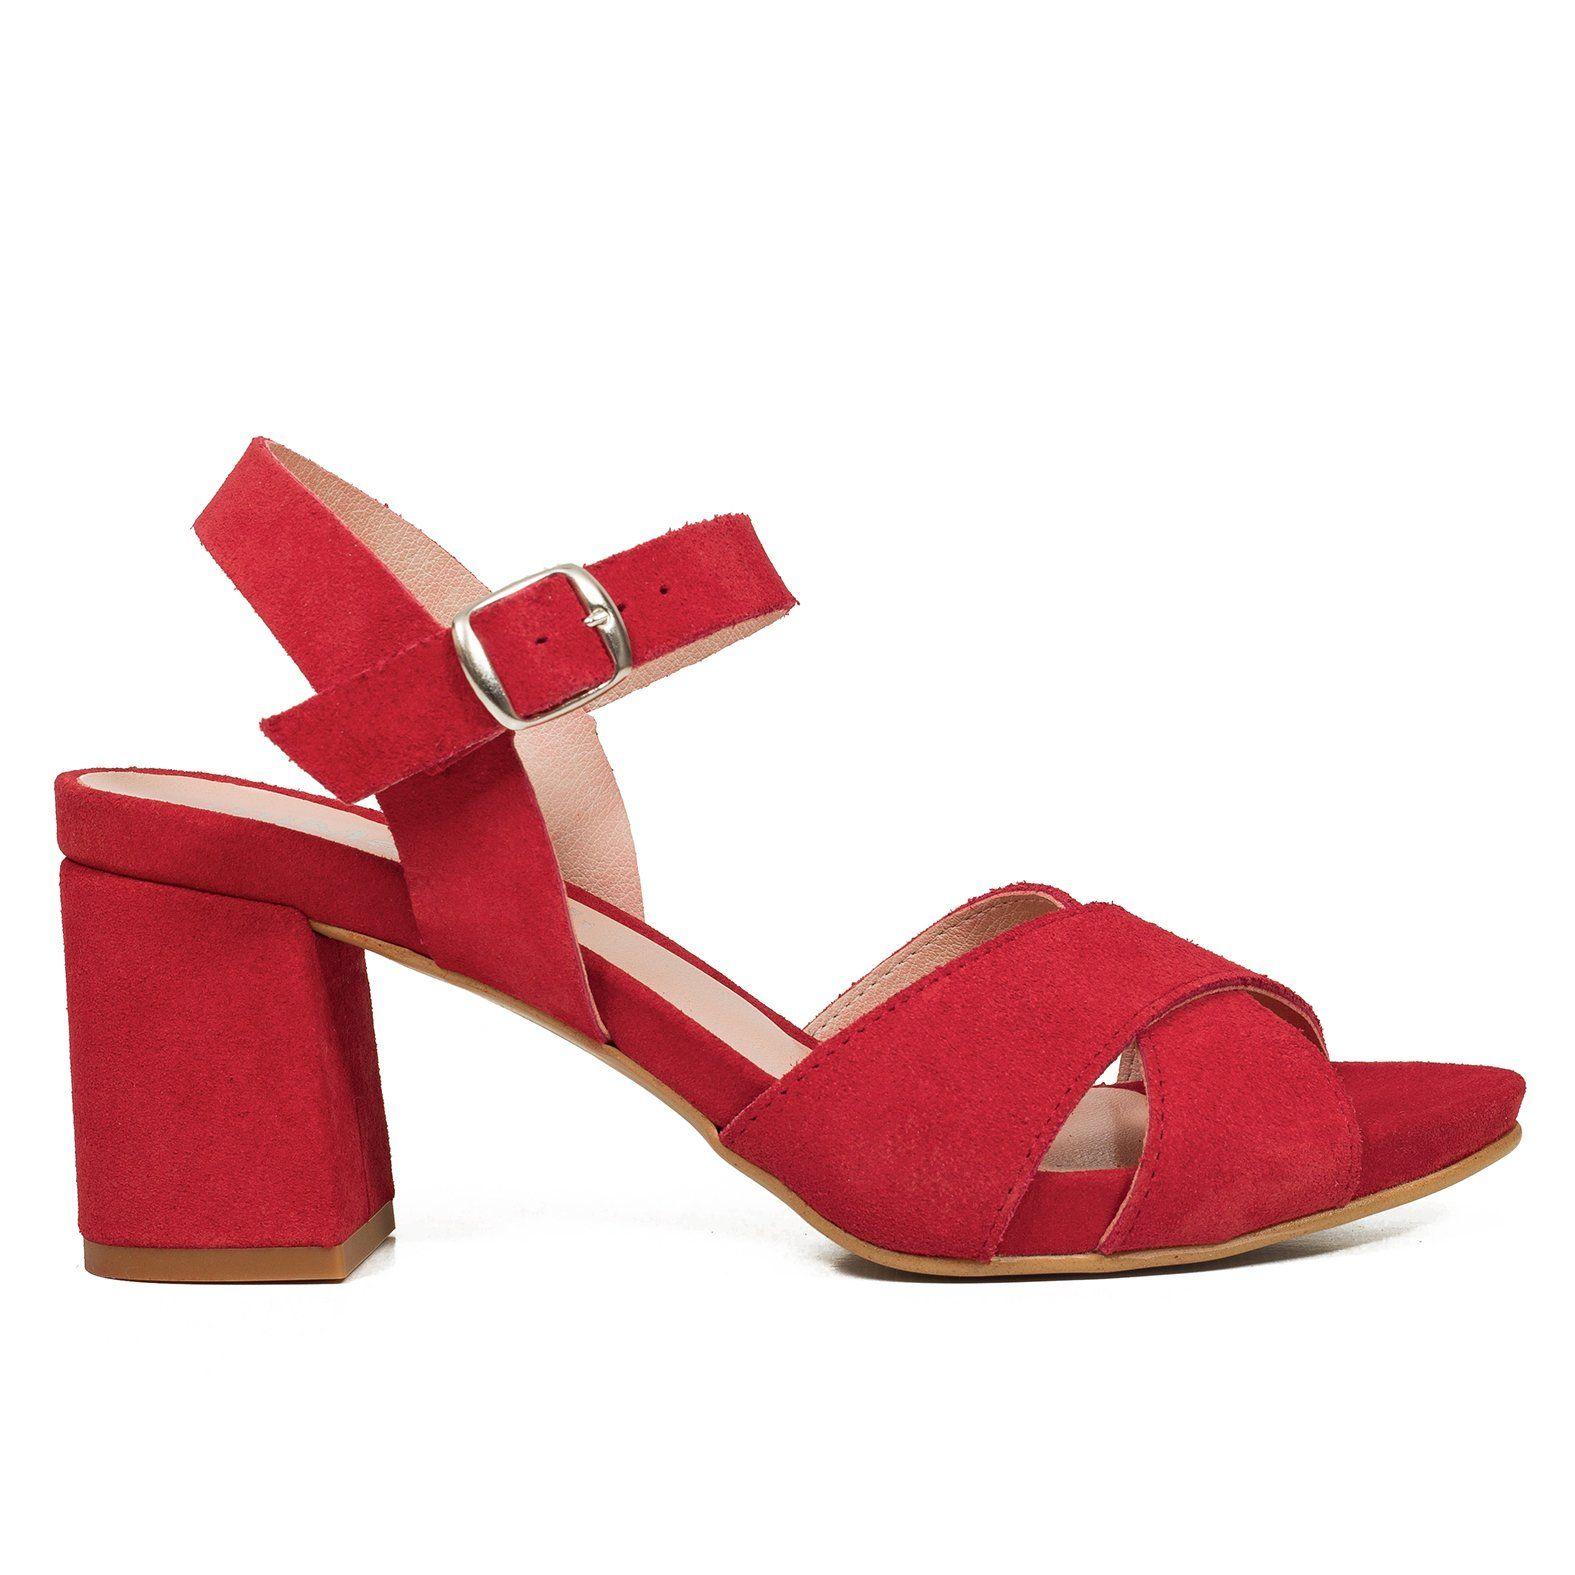 popular stores classic fit elegant shoes CASUAL Sandalias tacón ancho medio ROJO en 2019 | Sandalias ...